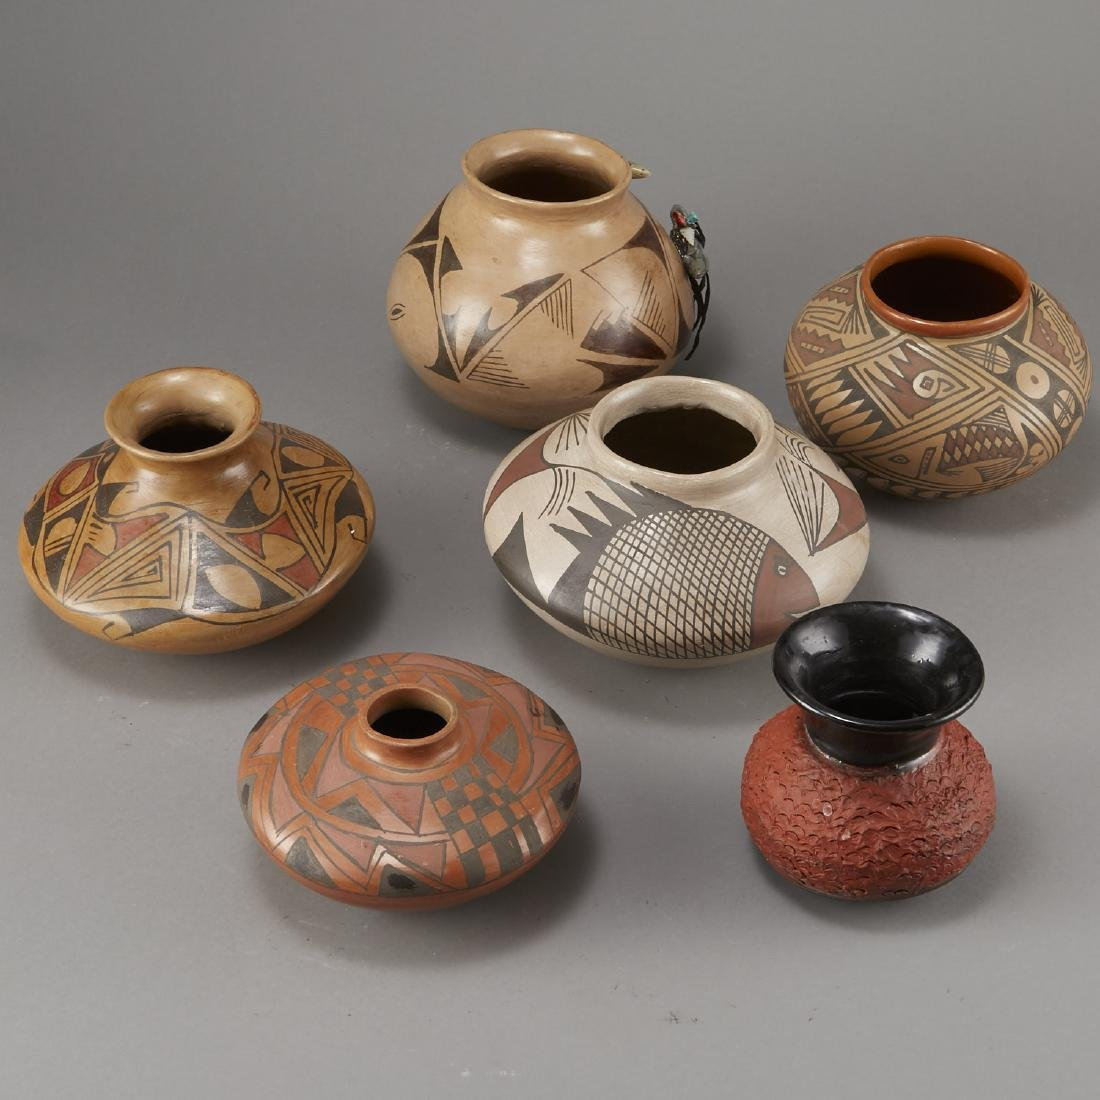 Group of 6 Polychrome Jars Fetish - 3